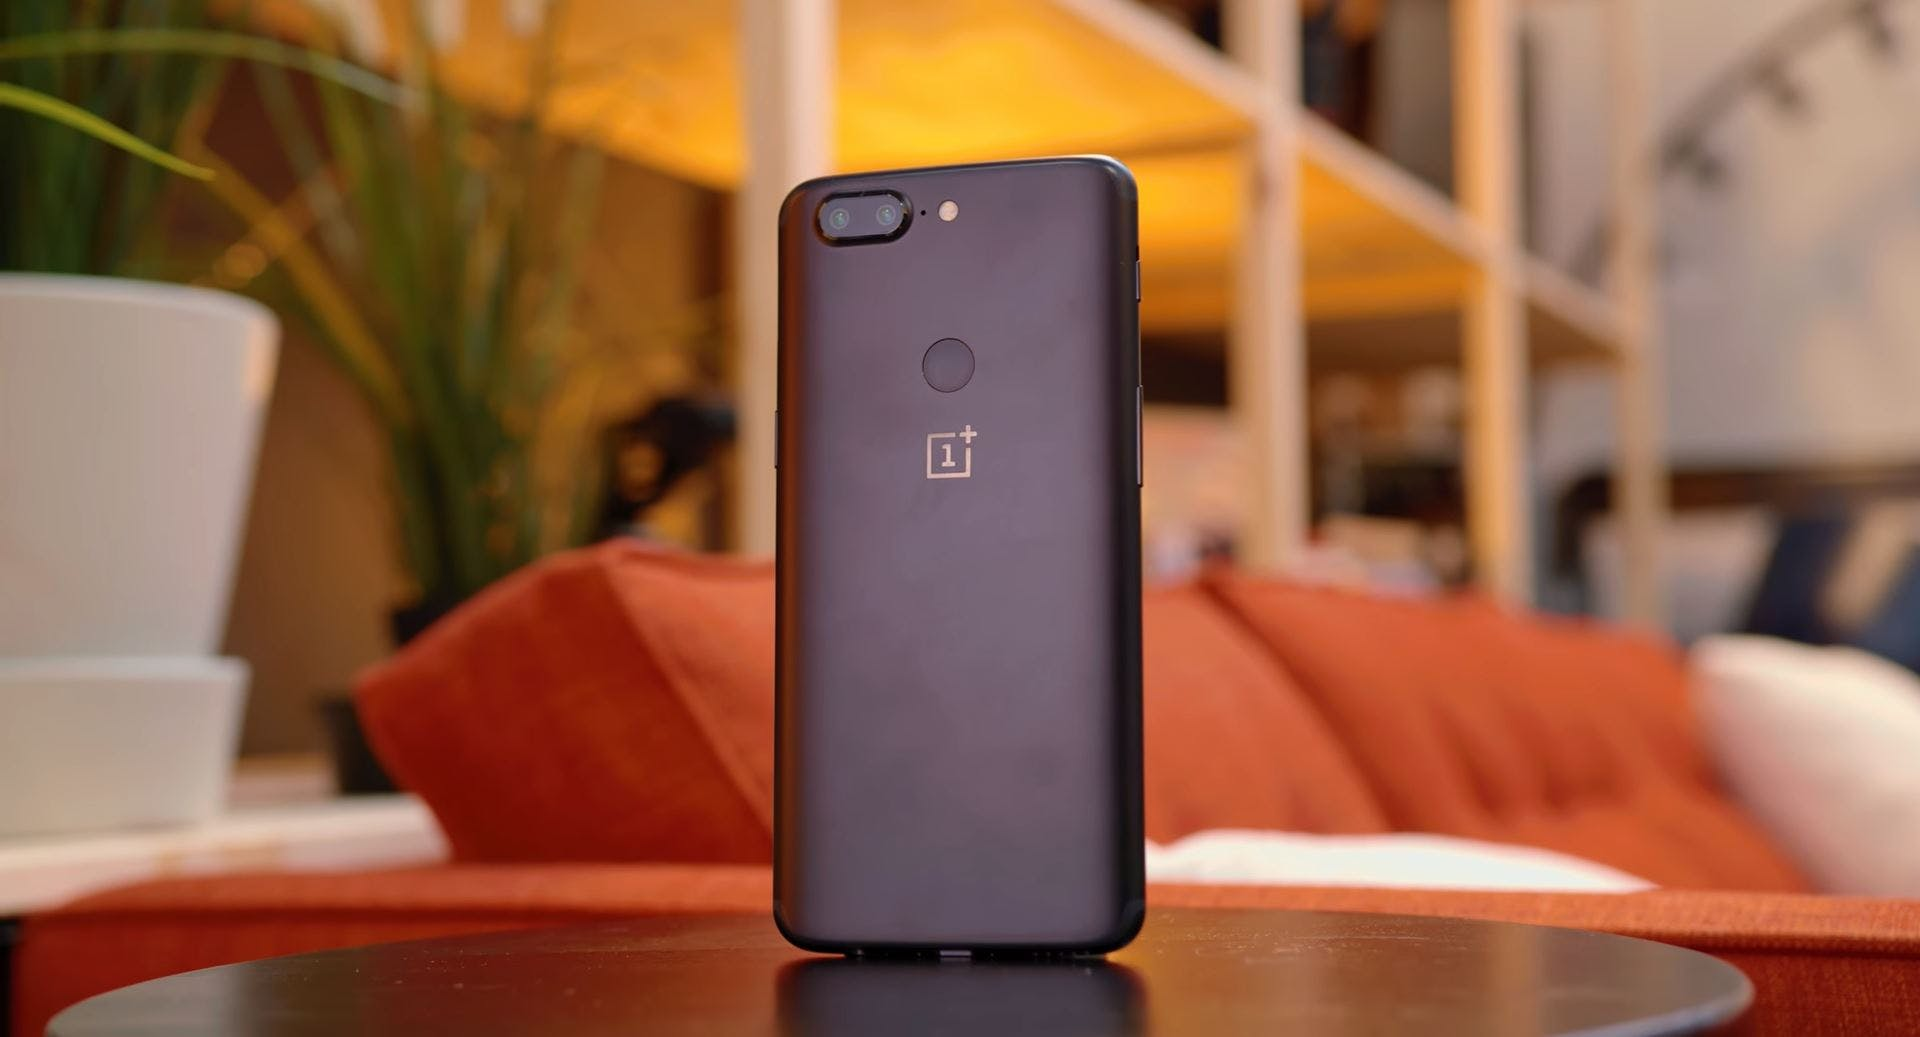 OnePlus 5T smartphone rear